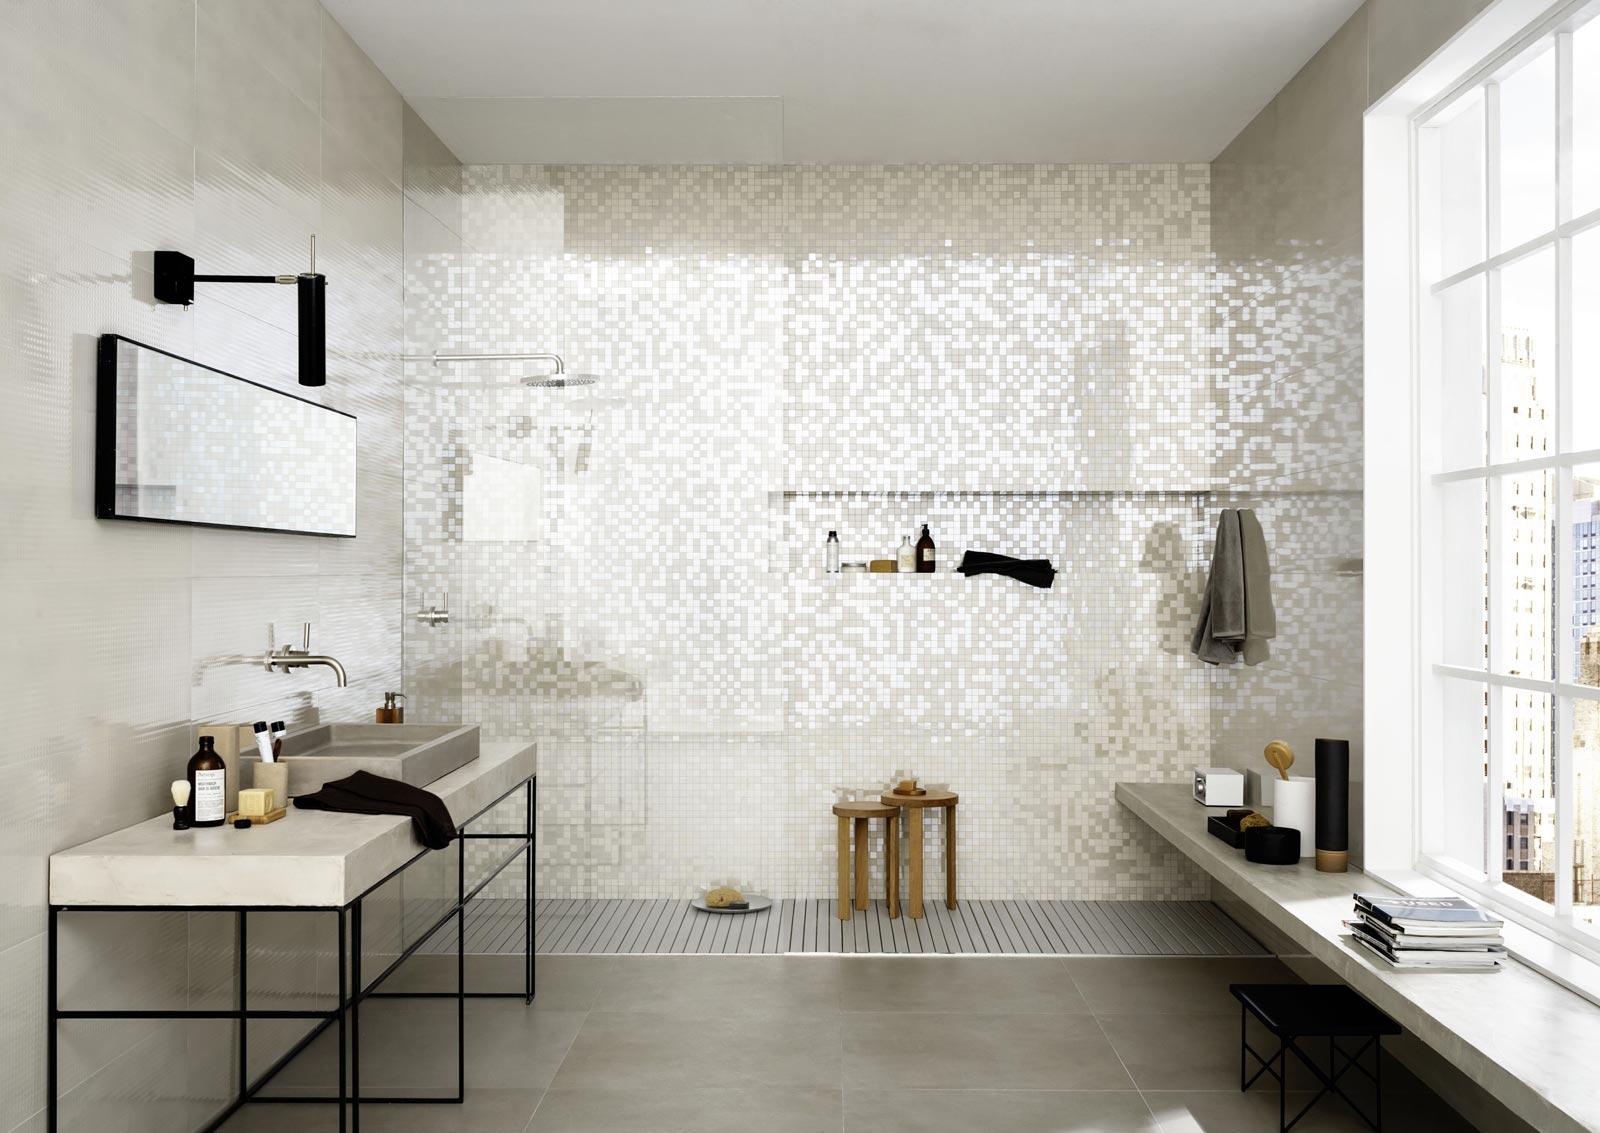 Mosaik Fliesen Dusche Pflege : Marazzi Porcelain Tile Shower